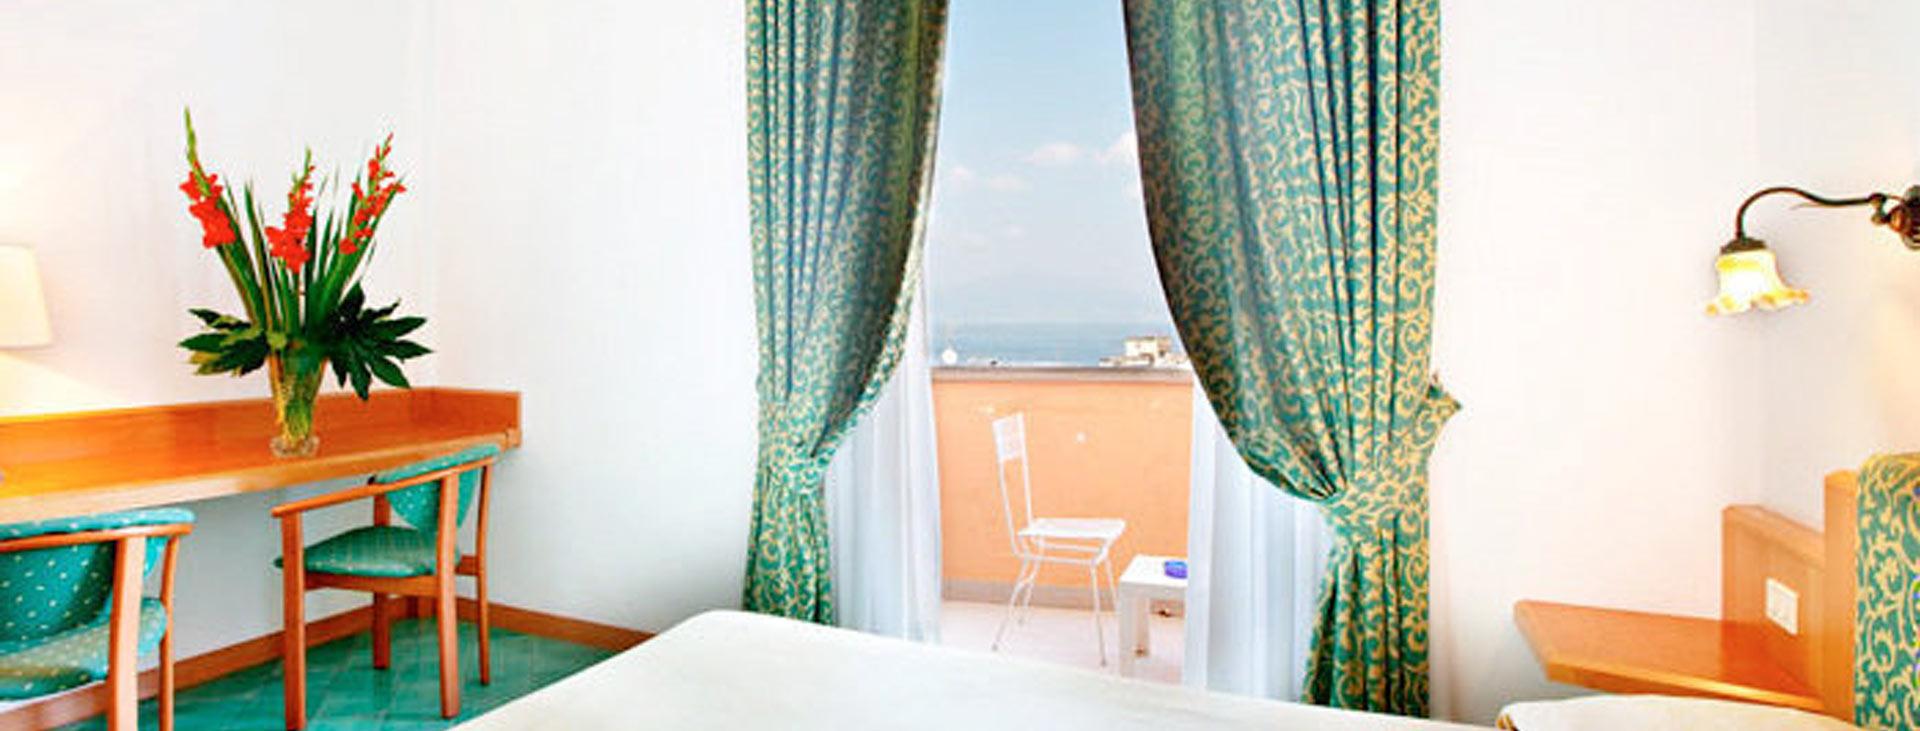 Villa Maria, Sorrento, Amalfin rannikko, Italia